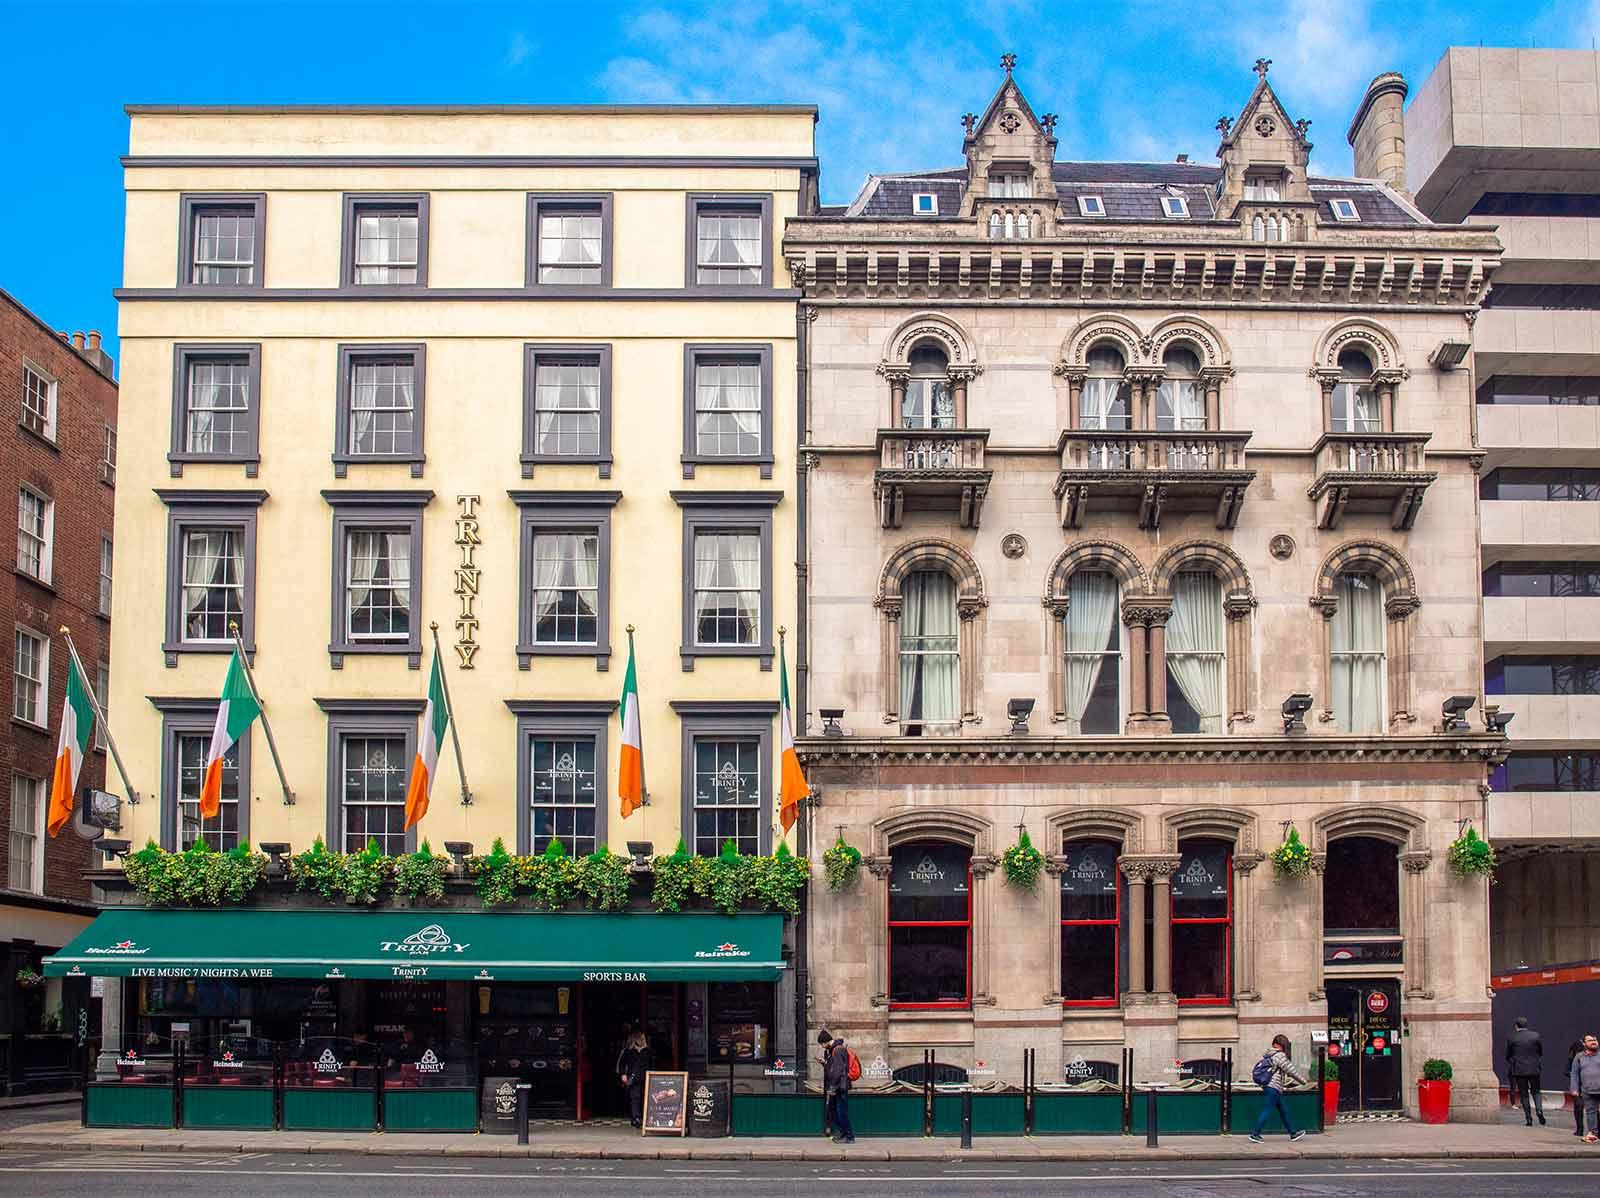 Dublin Citi Hotel in Temple Bar